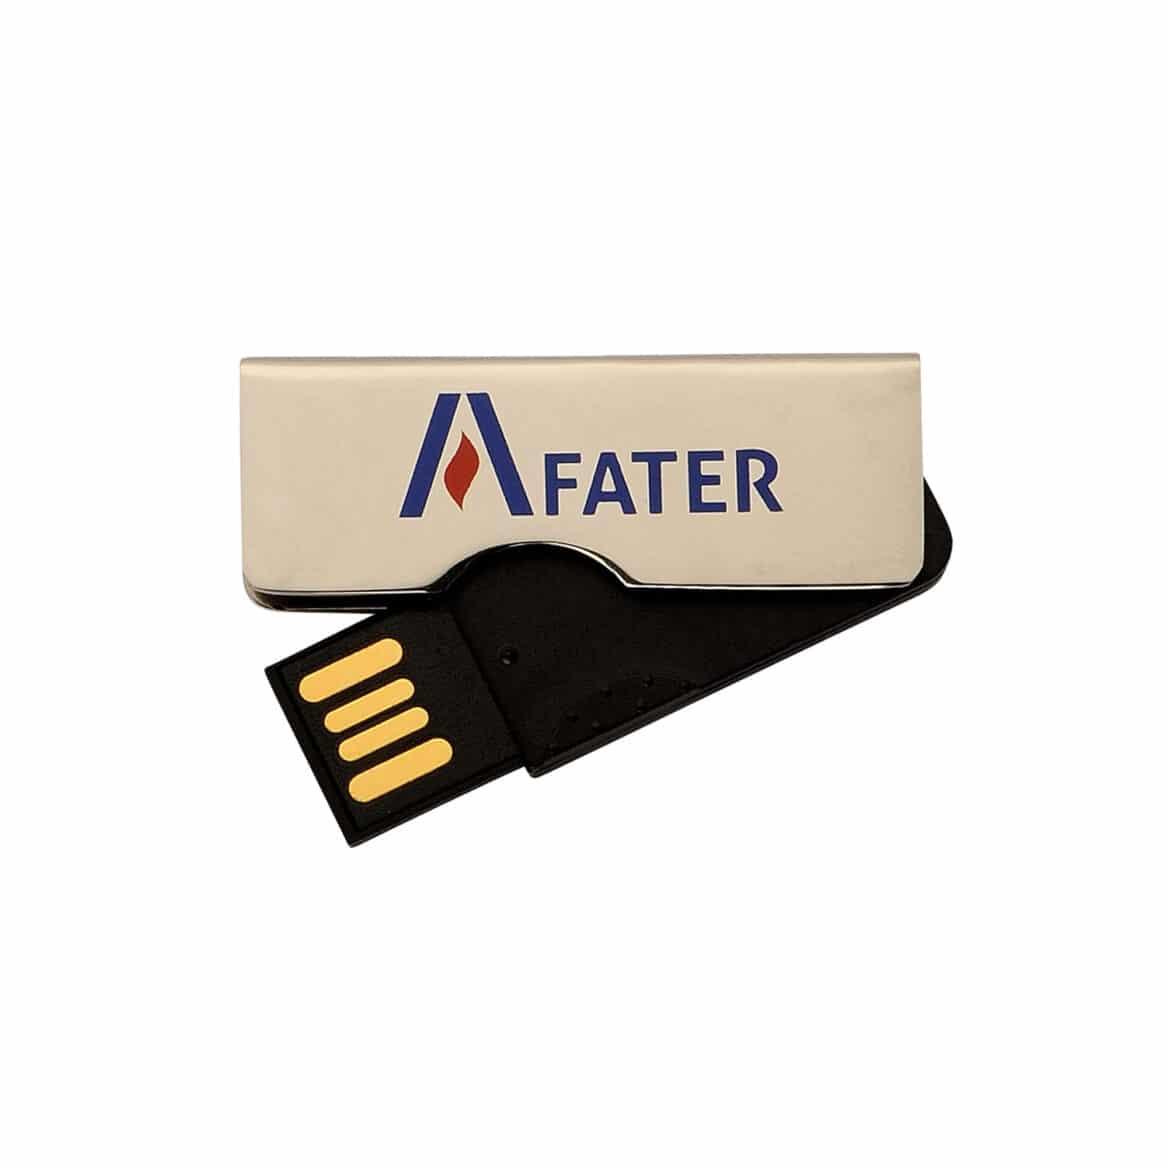 Chiavette usb personalizzate low-cost logo Fater